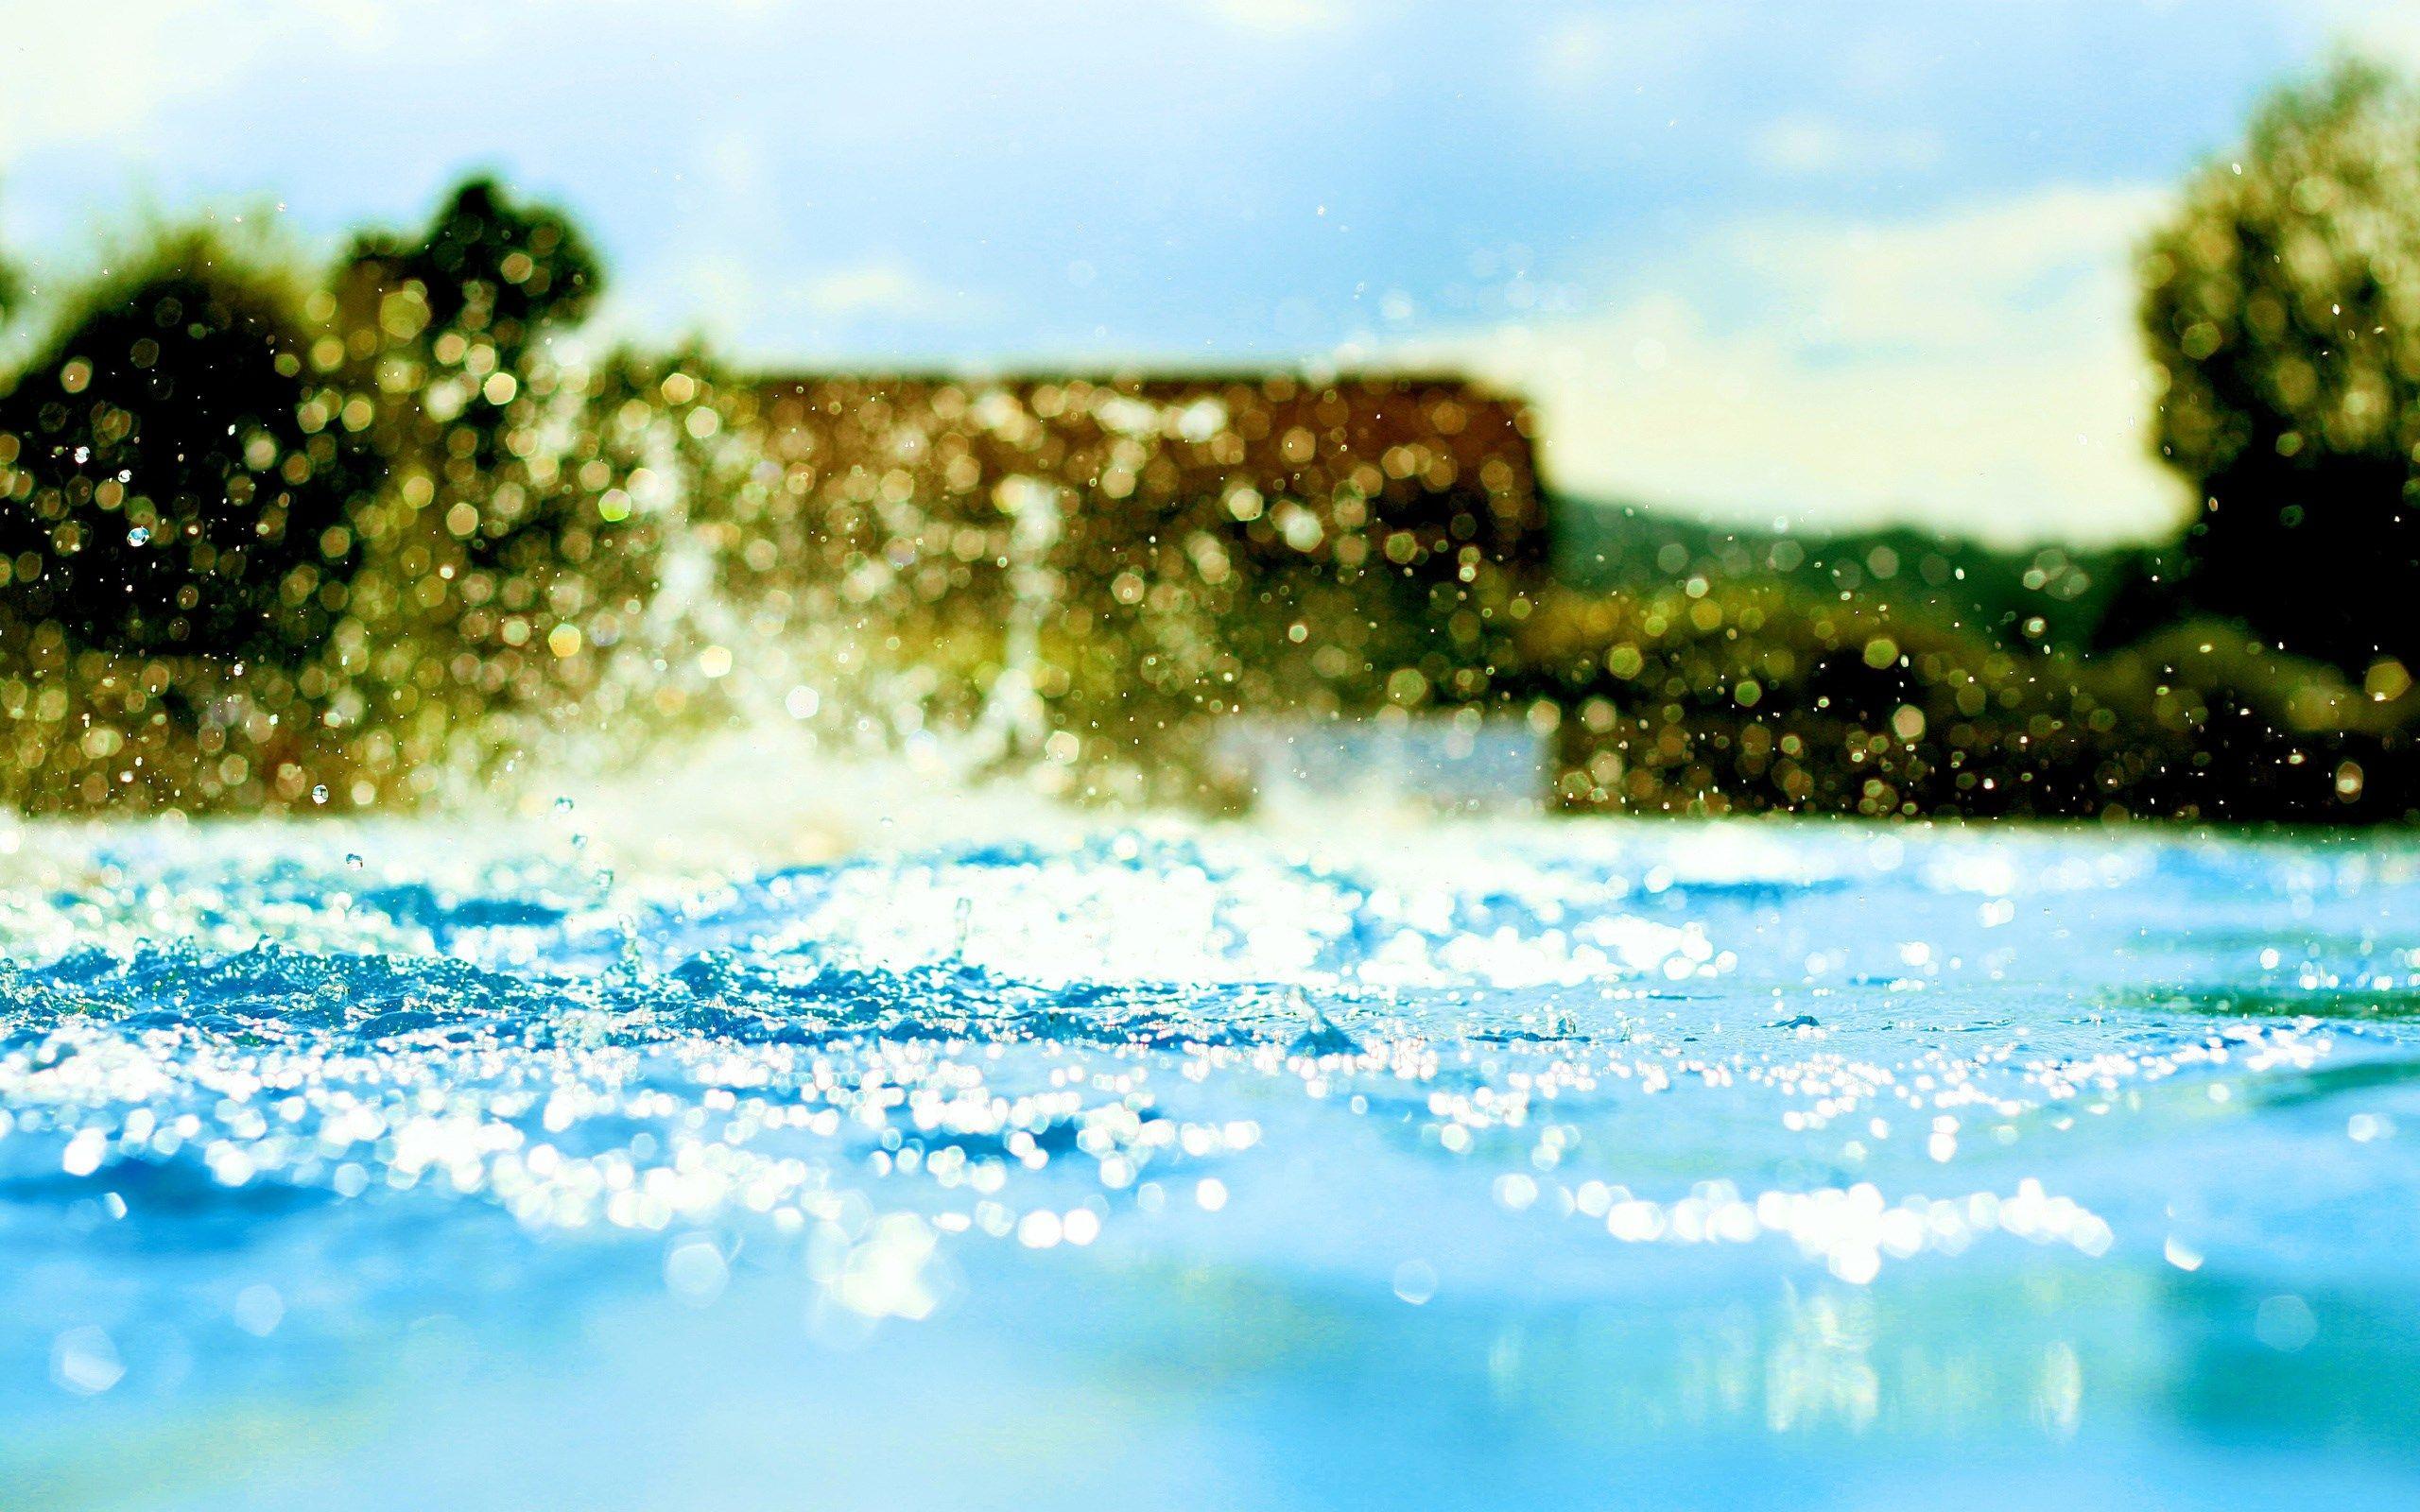 Widescreen hd water hueputalo pinterest hd backgrounds and water